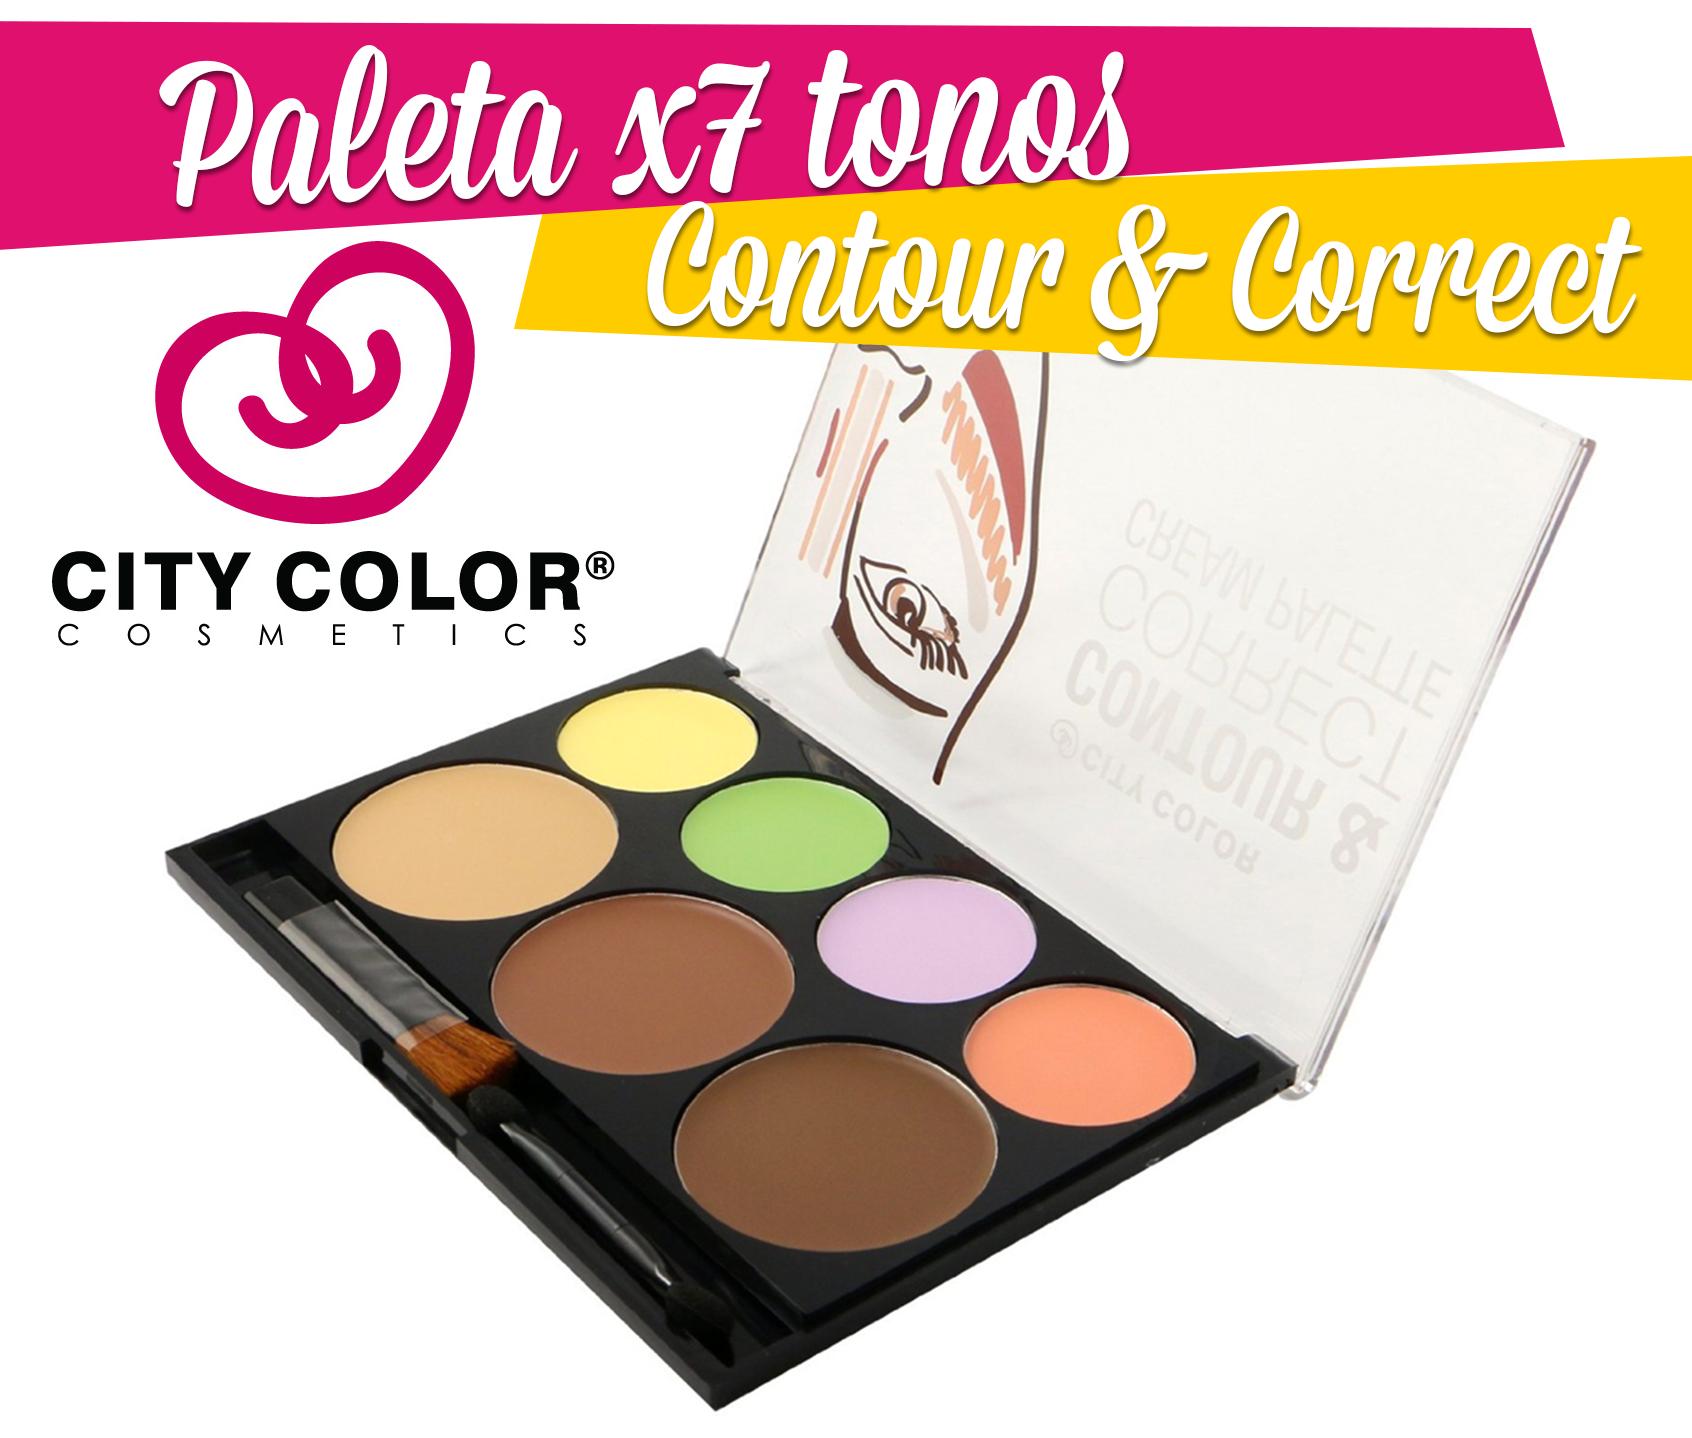 paleta contouring